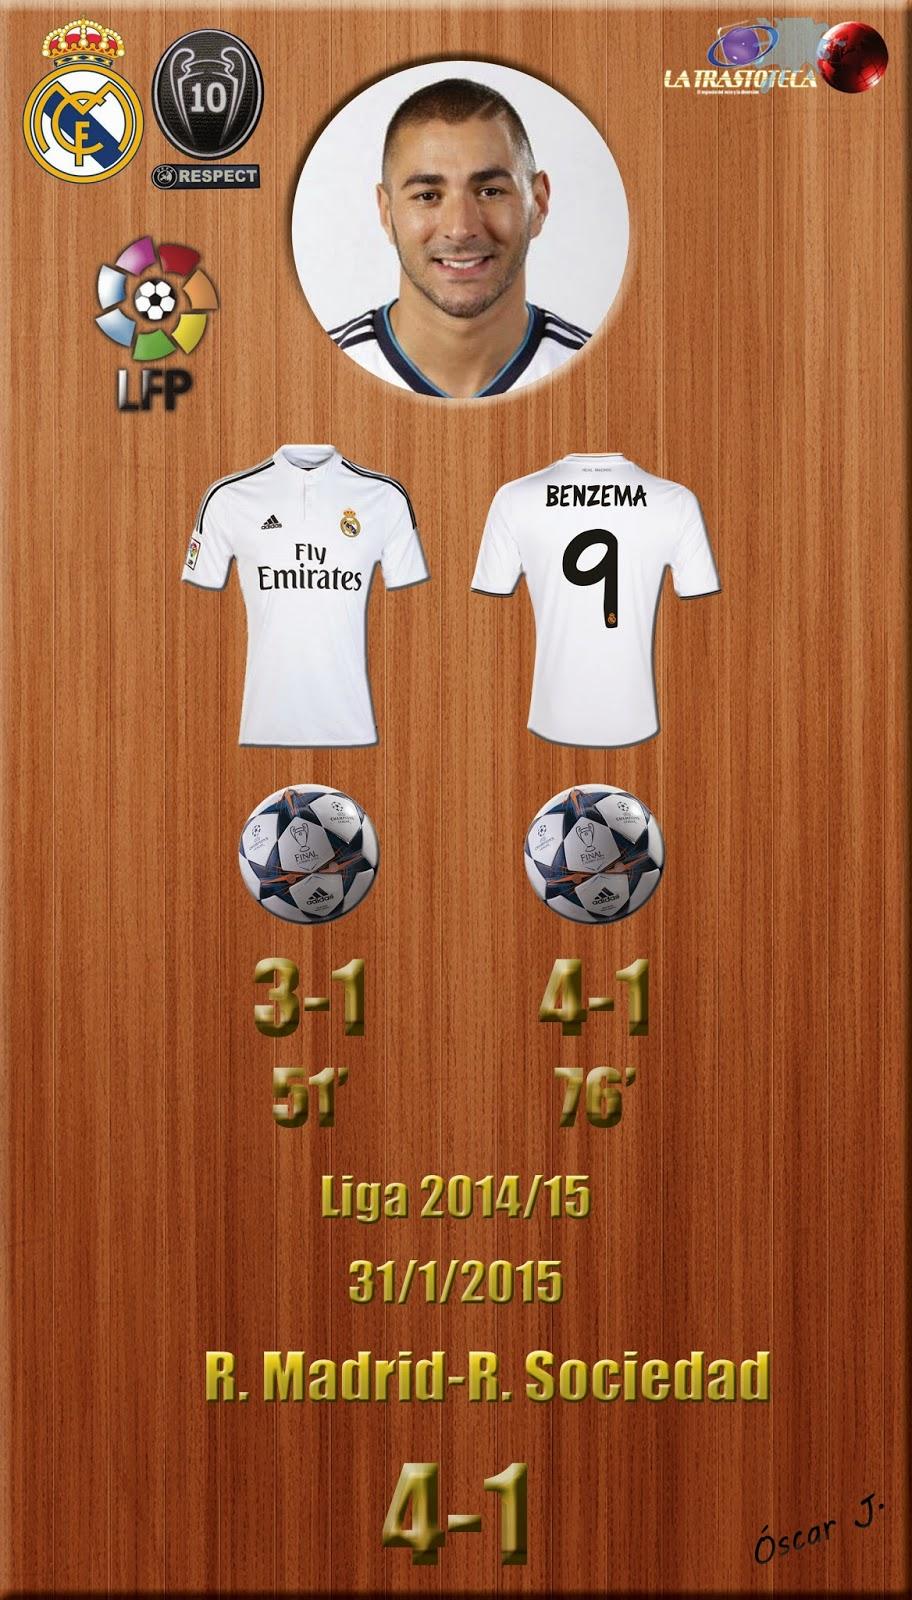 Benzema (Doblete) - Real Madrid 4-1 Real Sociedad - Liga 2014/15 - Jornada 21 - (31/1/2015)